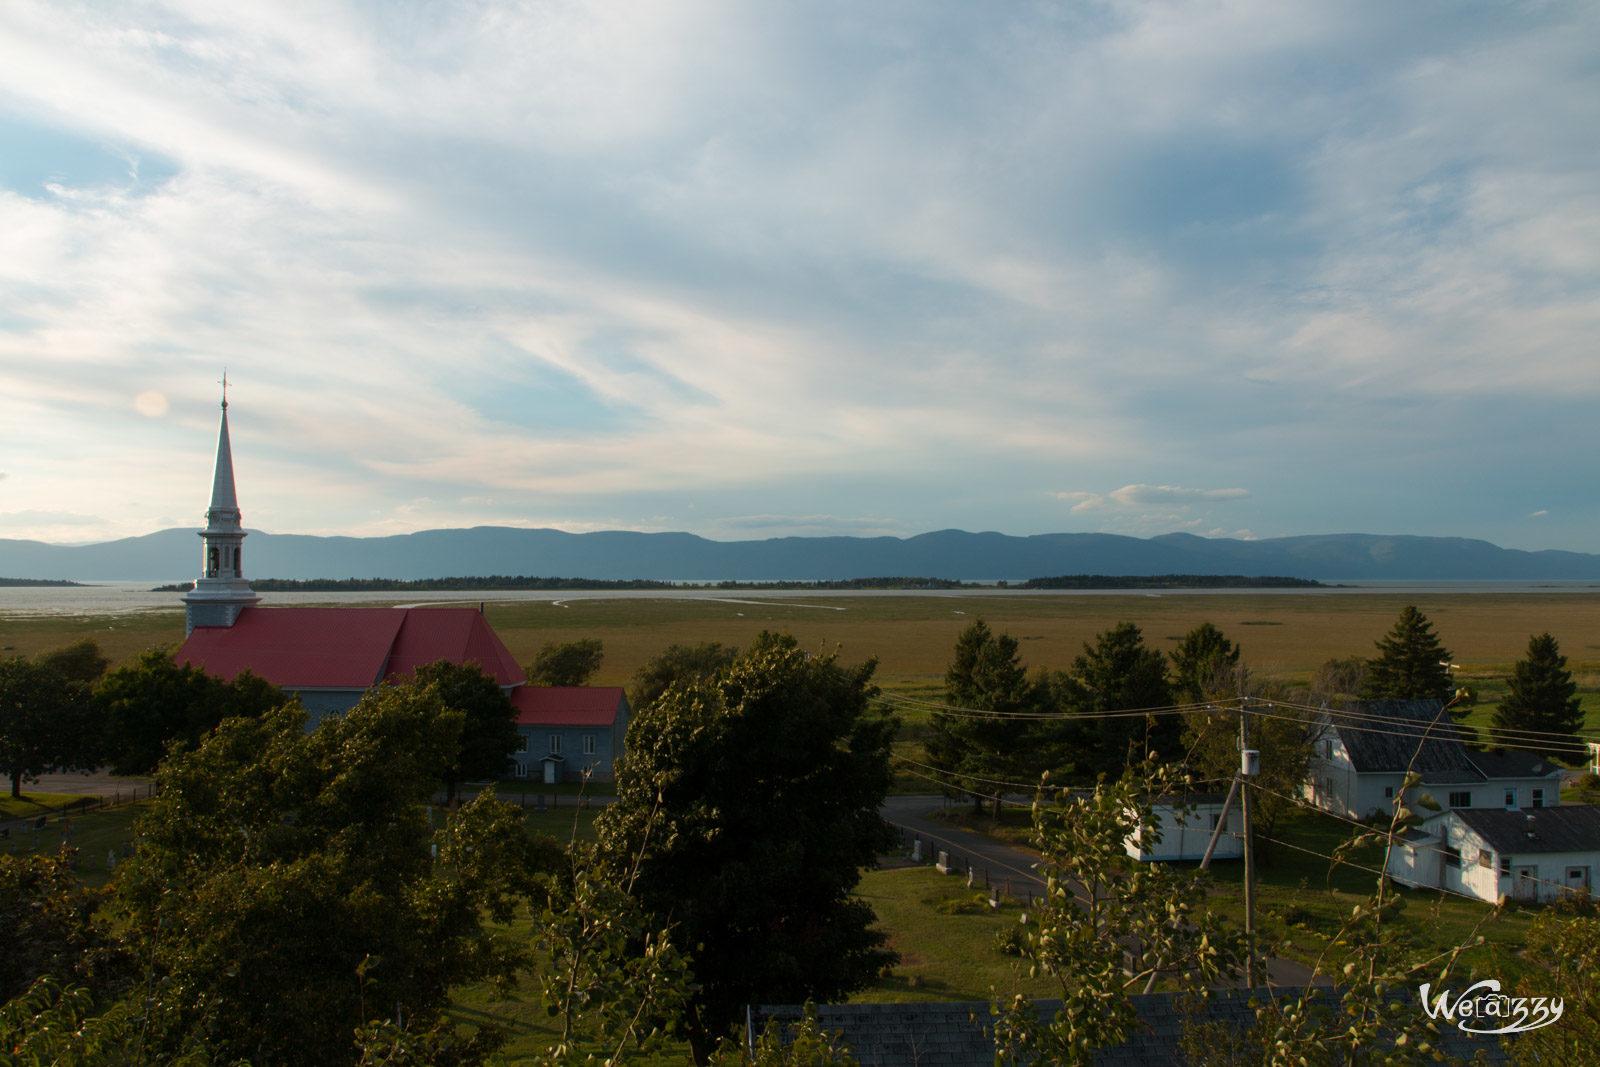 Canada, Ile aux grues, Montmagny, Québec